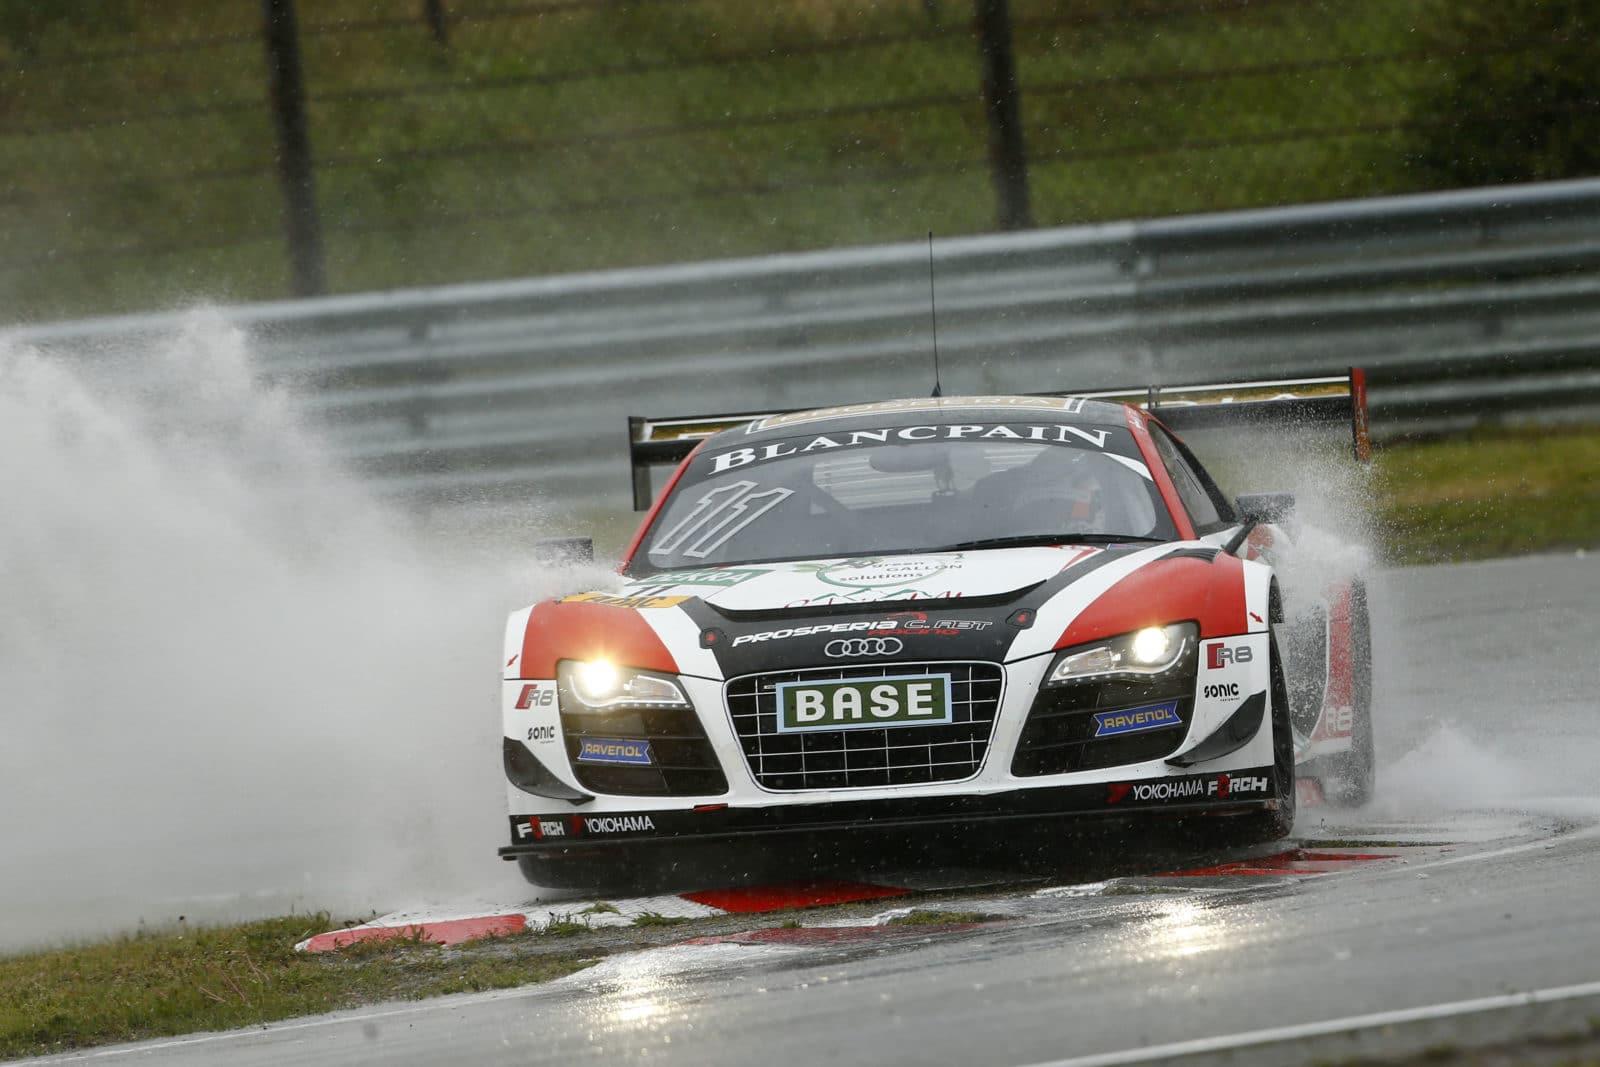 11.05.2014 - ADAC GT Masters ADAC GT Masters, Zandvoort, Prosperia C. Abt Racing, Nicki Thiim, Fabian Hamprecht